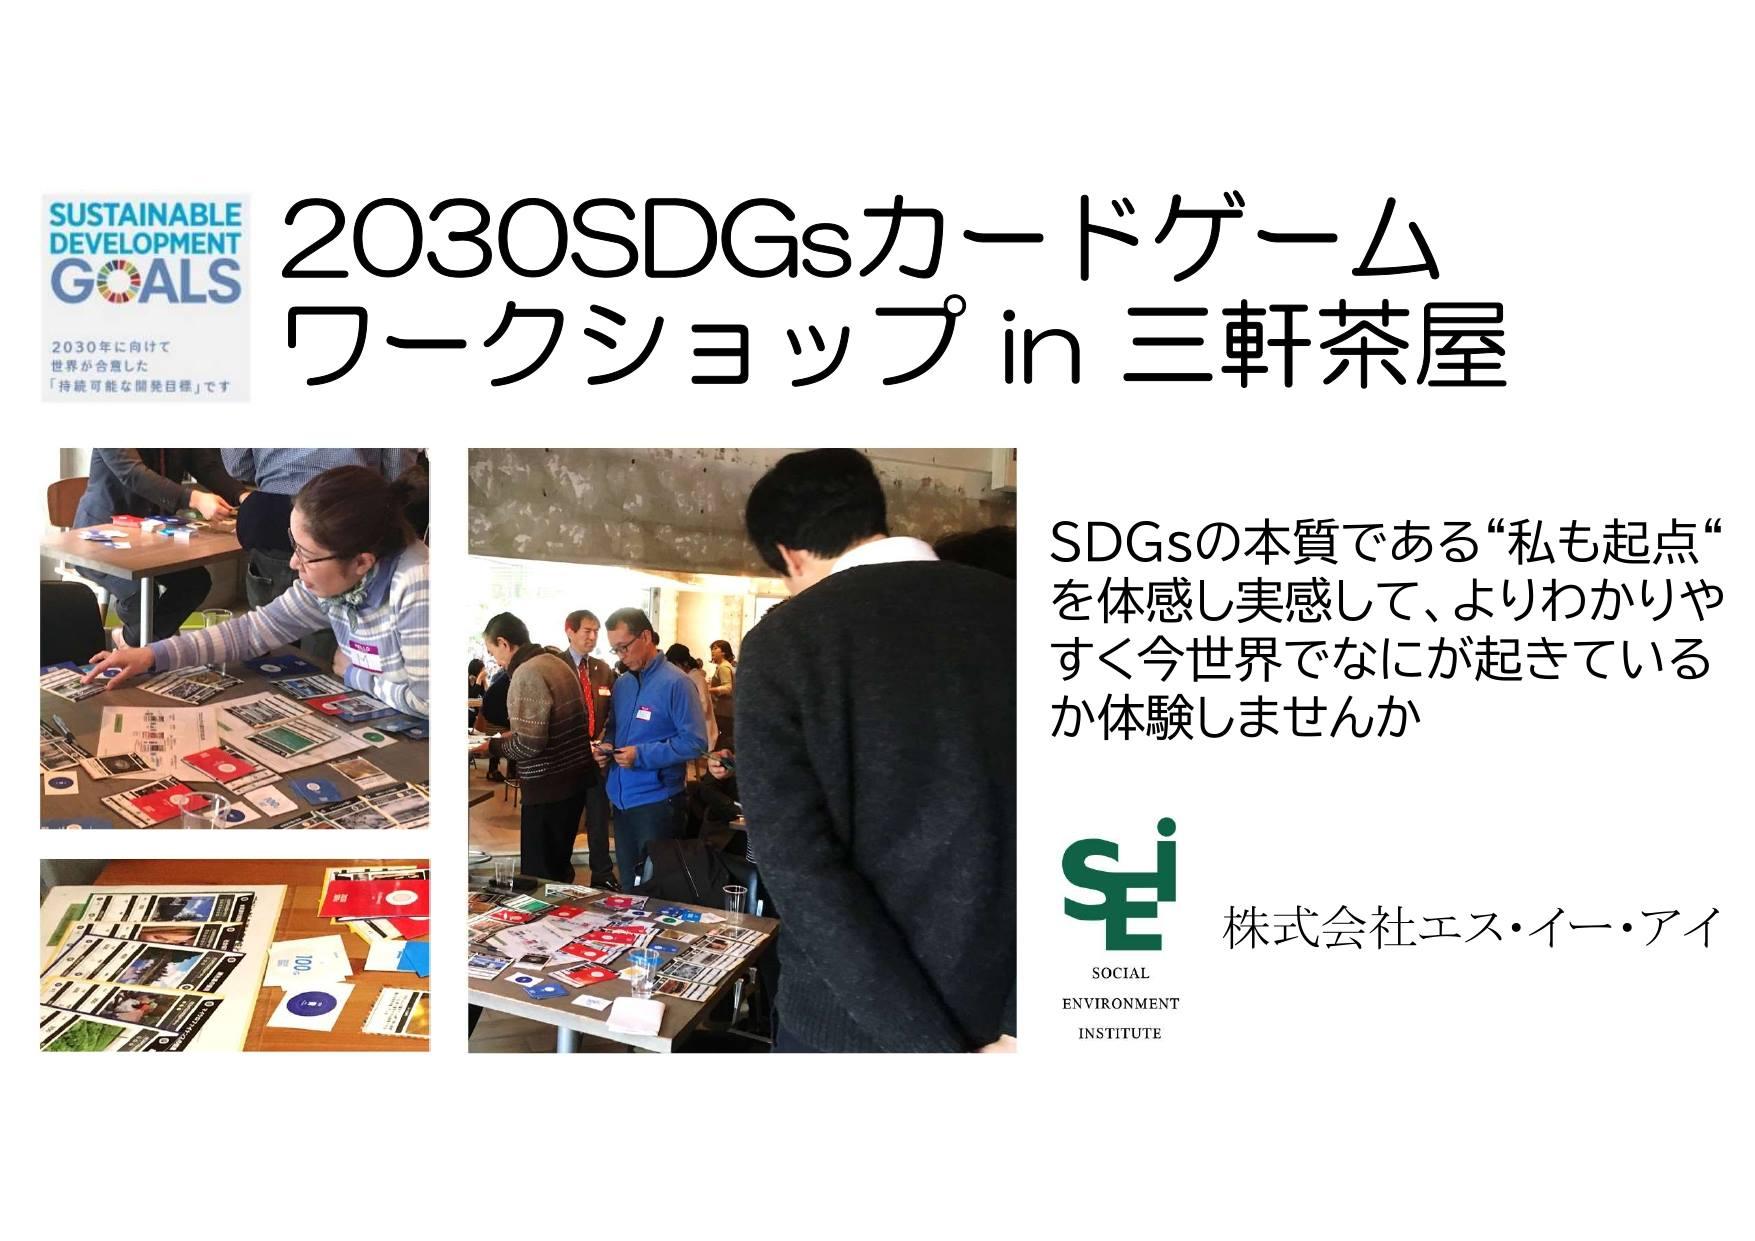 2030SDGsカードゲーム ワークショップ in 三軒茶屋